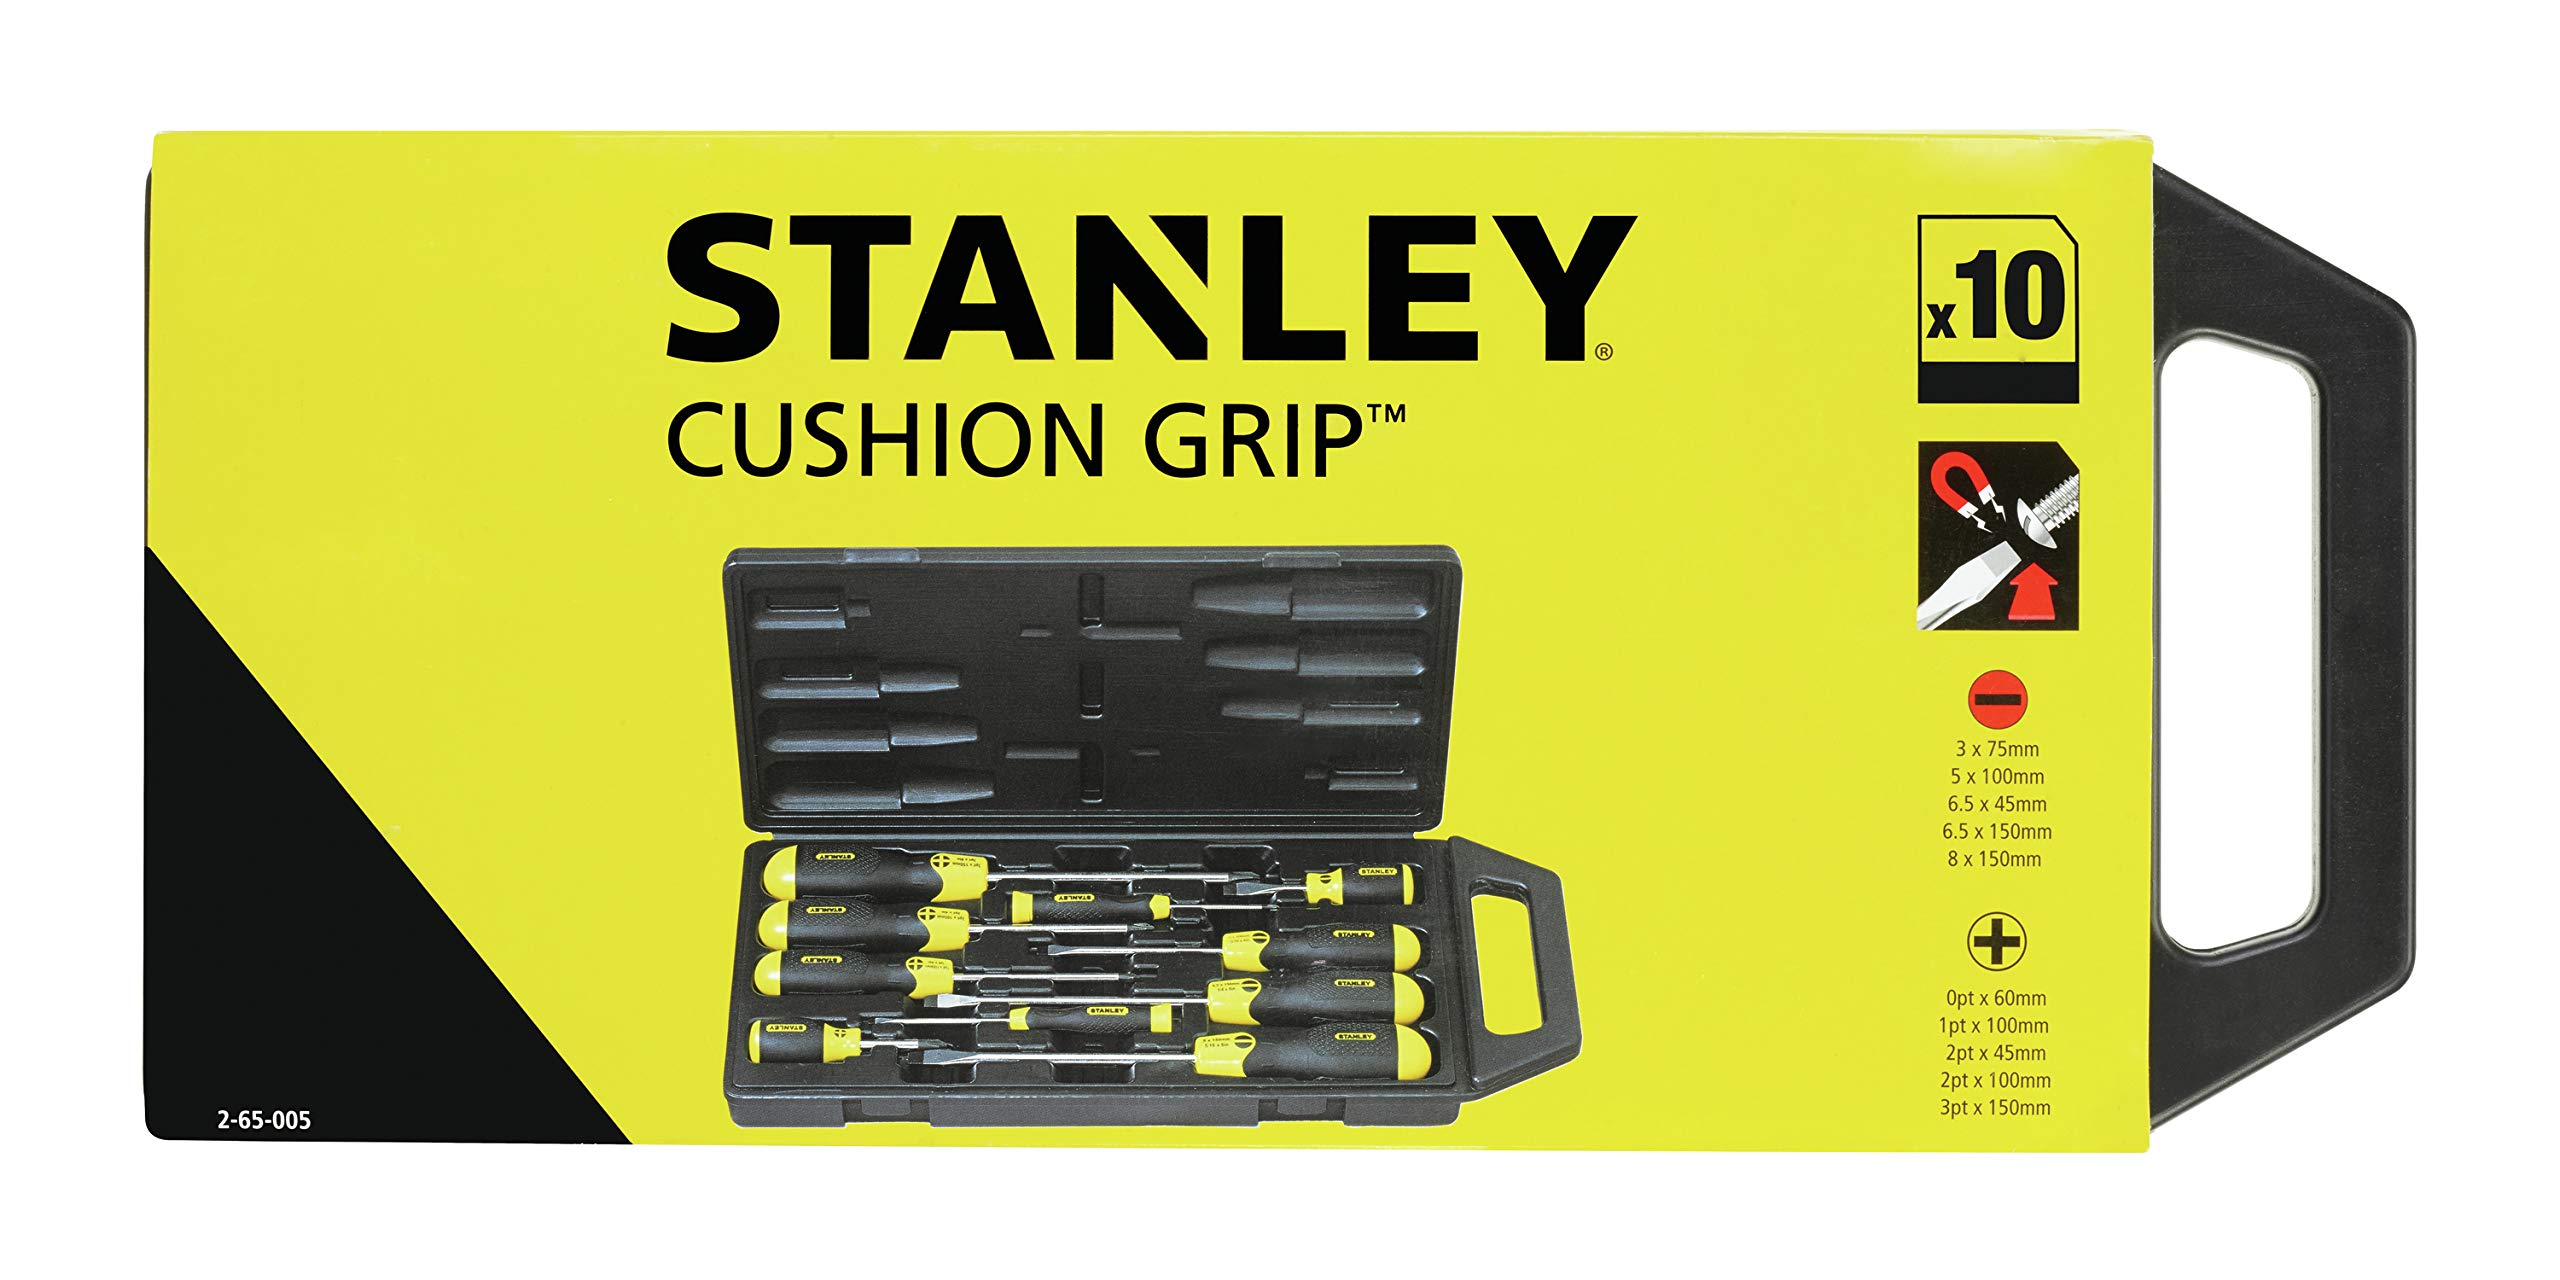 "Stanley 2-65-005 PH""Cushion Grip"" Screwdriver, Multi-Colour, Set of 10 Piece"